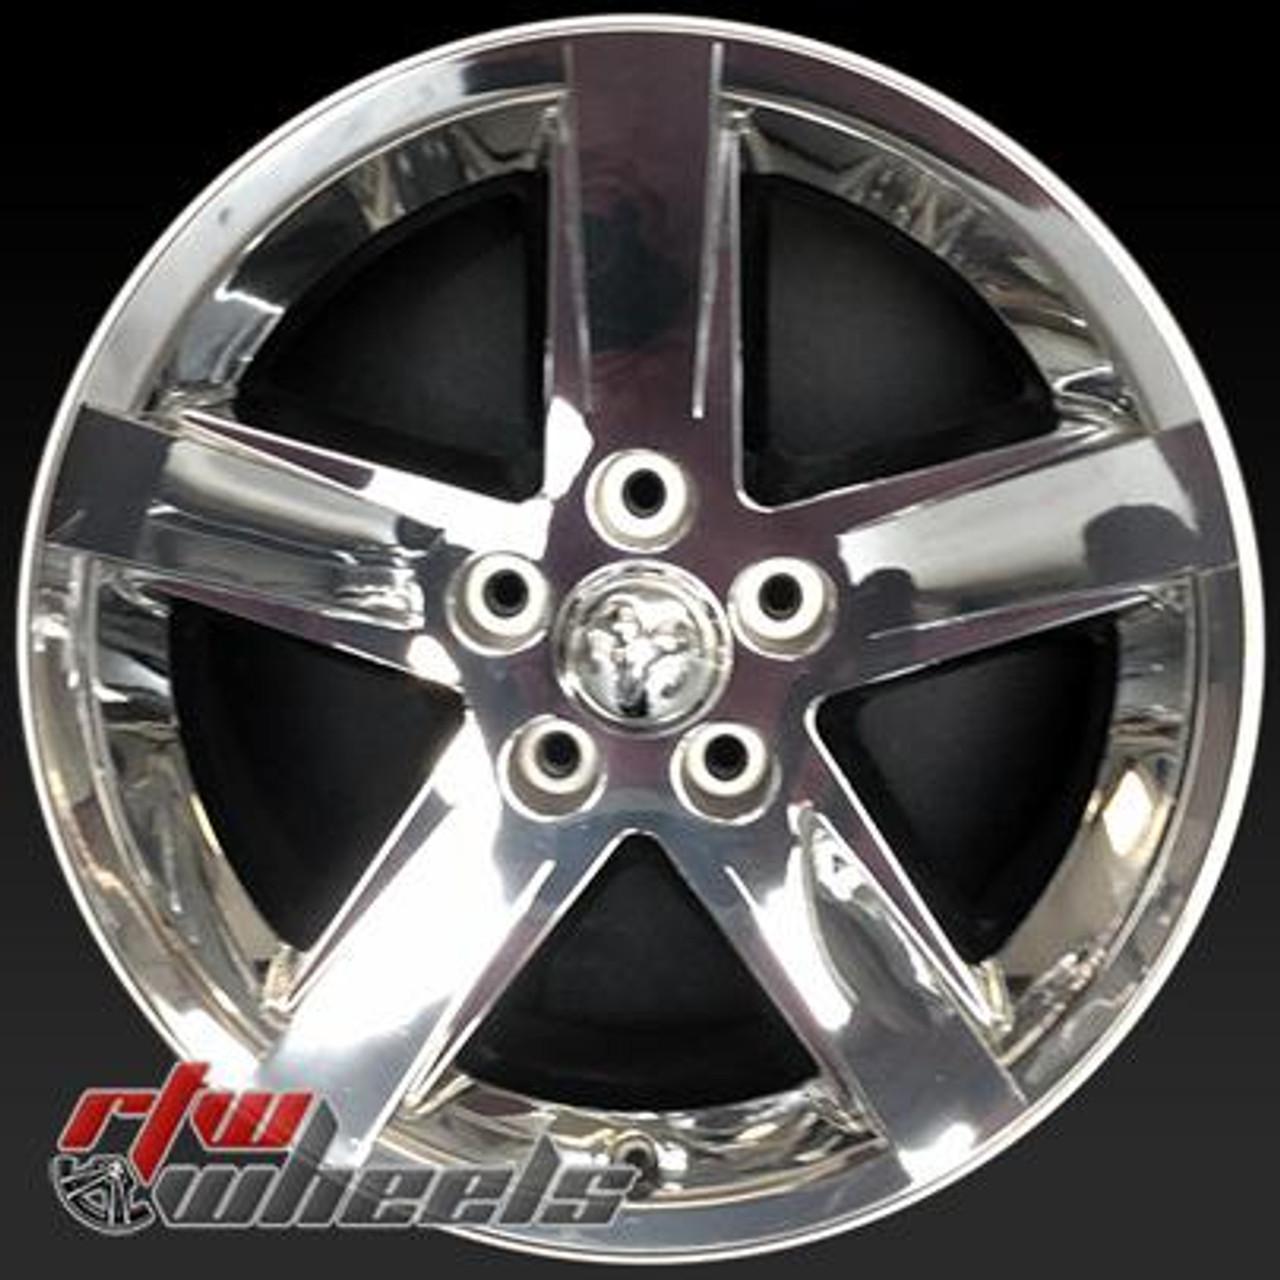 Dodge Ram Rims >> Dodge Ram Wheels For Sale 2009 2014 Chrome 2364